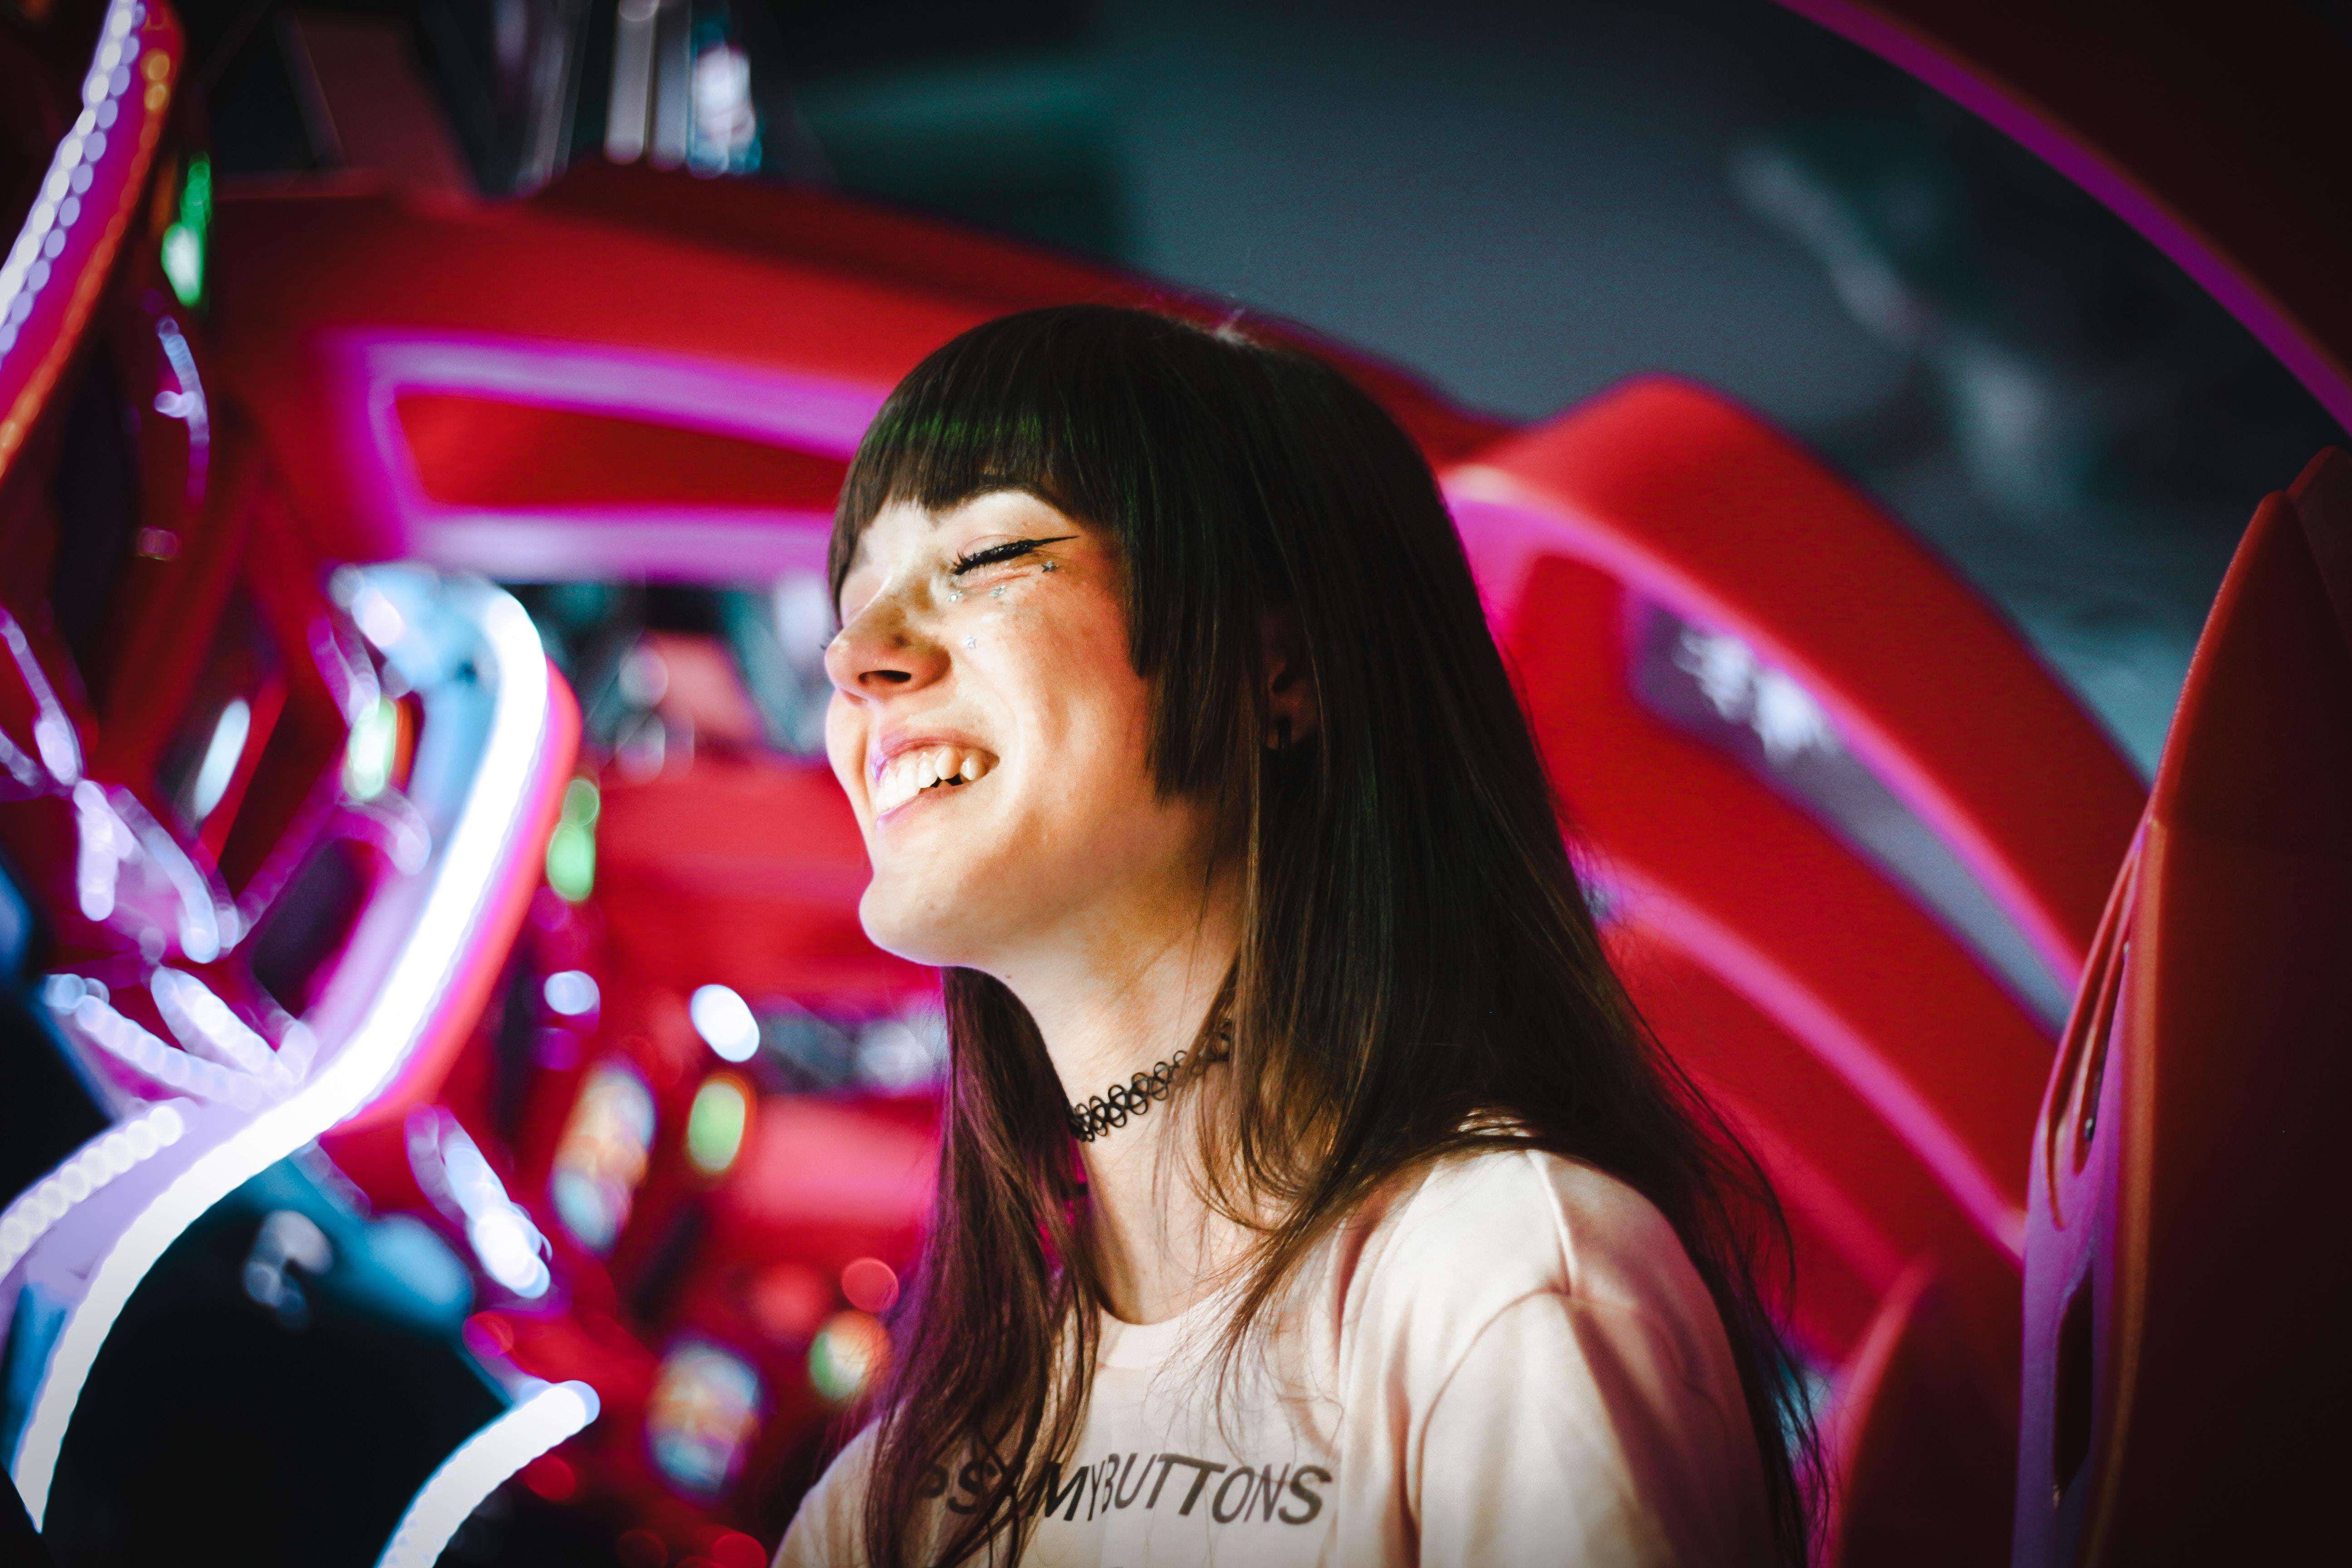 photo of smiling woman wearing black choker